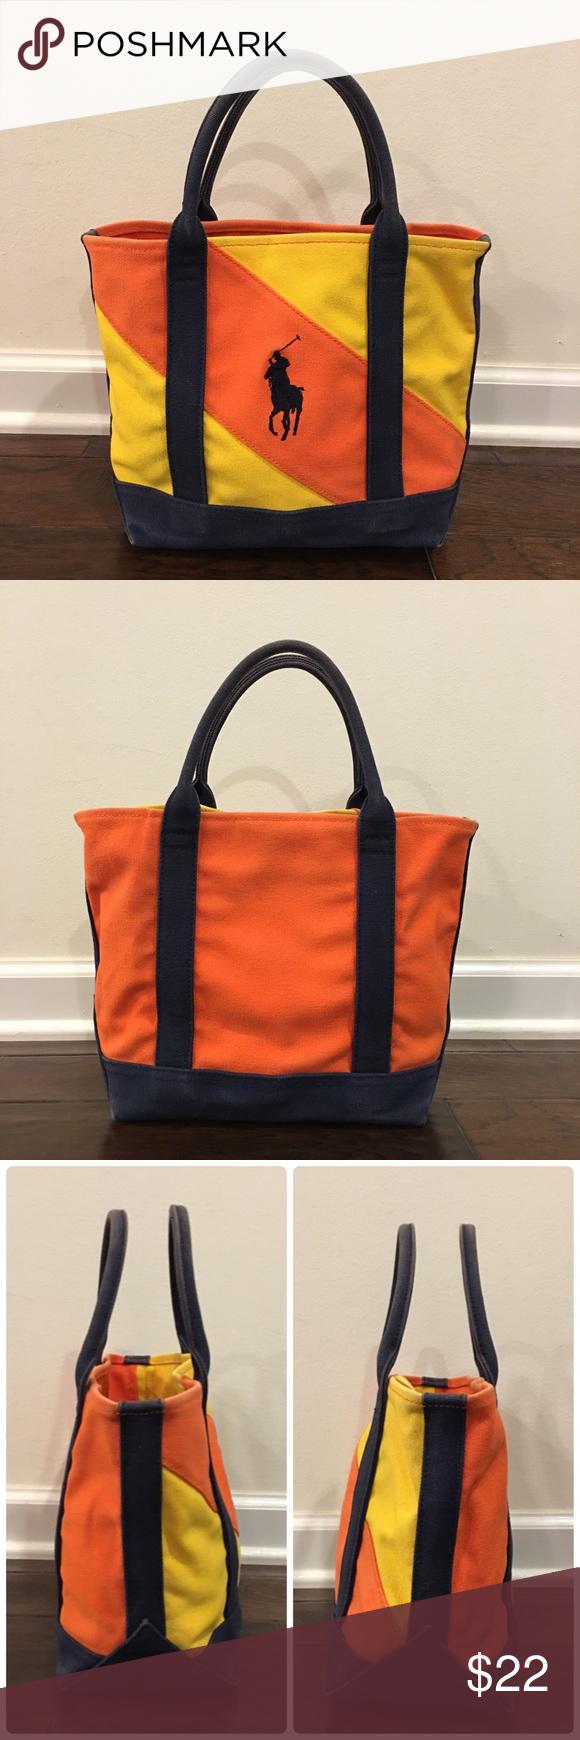 24af58adf13b Authentic Ralph Lauren Tote Canvas Bag - Medium Authentic Ralph Lauren Tote  Canvas Bag - M